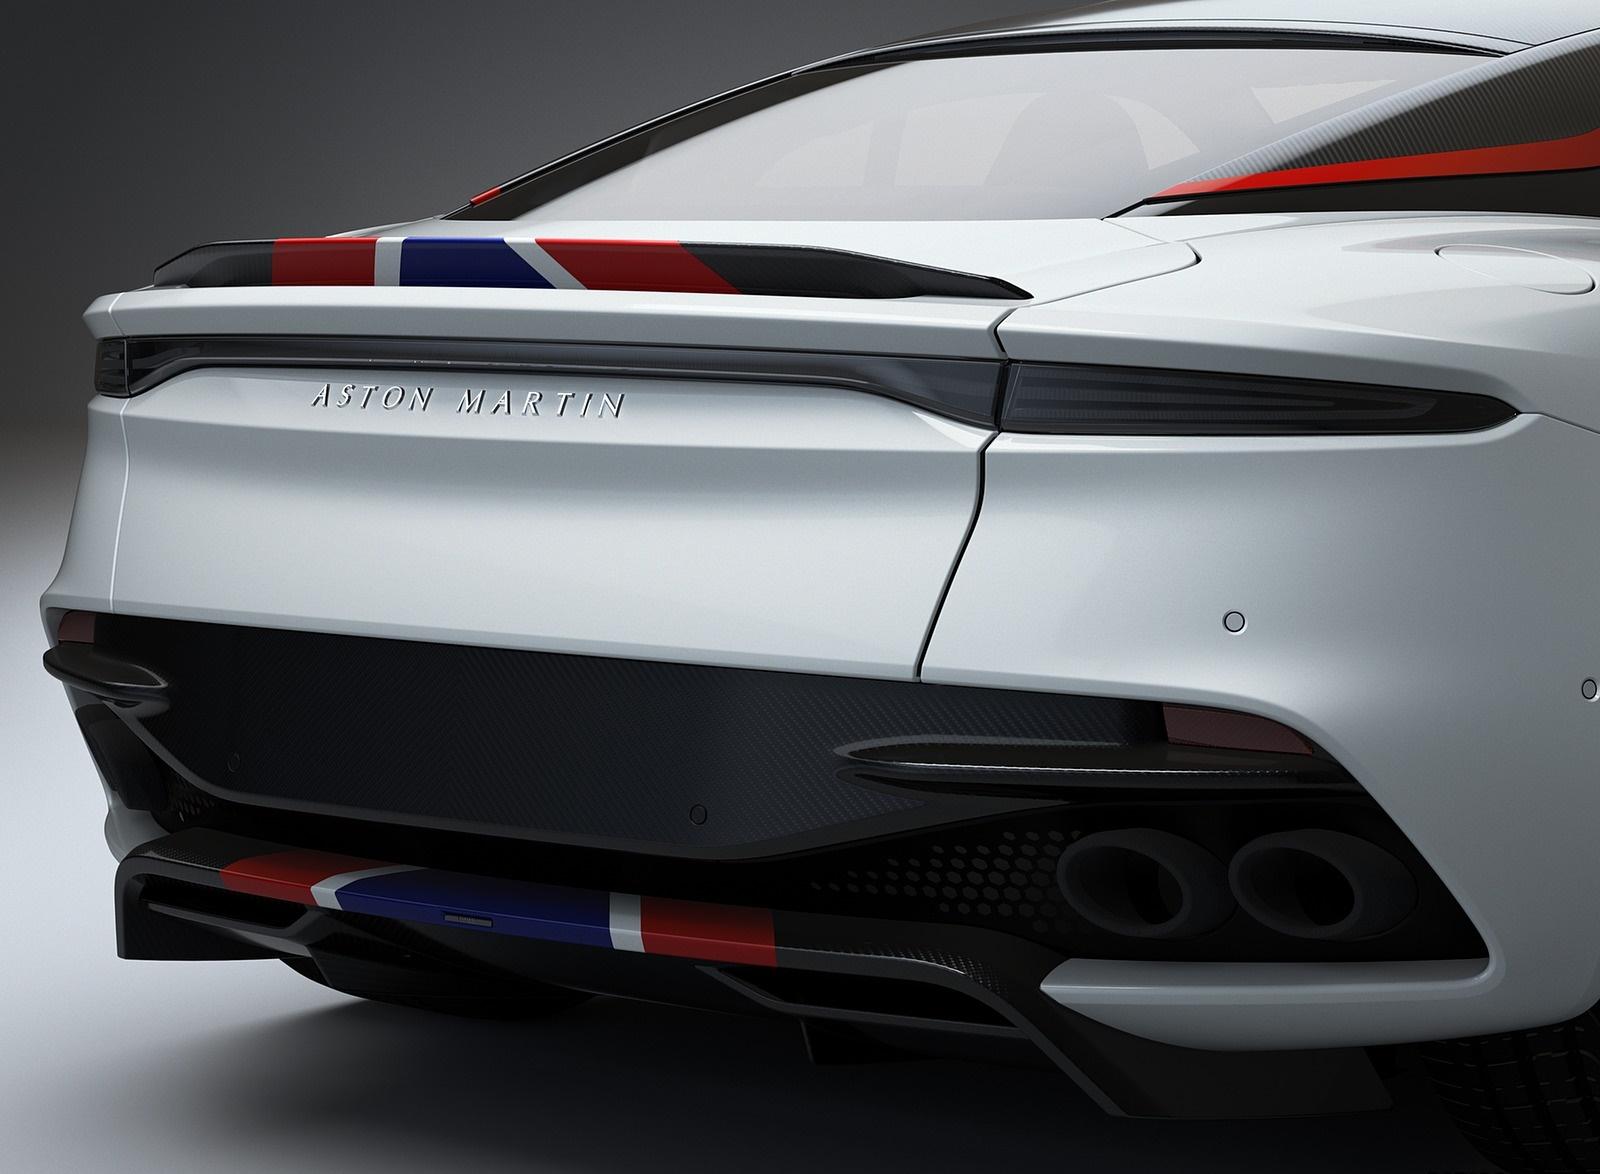 2019 Aston Martin DBS Superleggera Concorde Edition Tail Light Wallpapers (10)